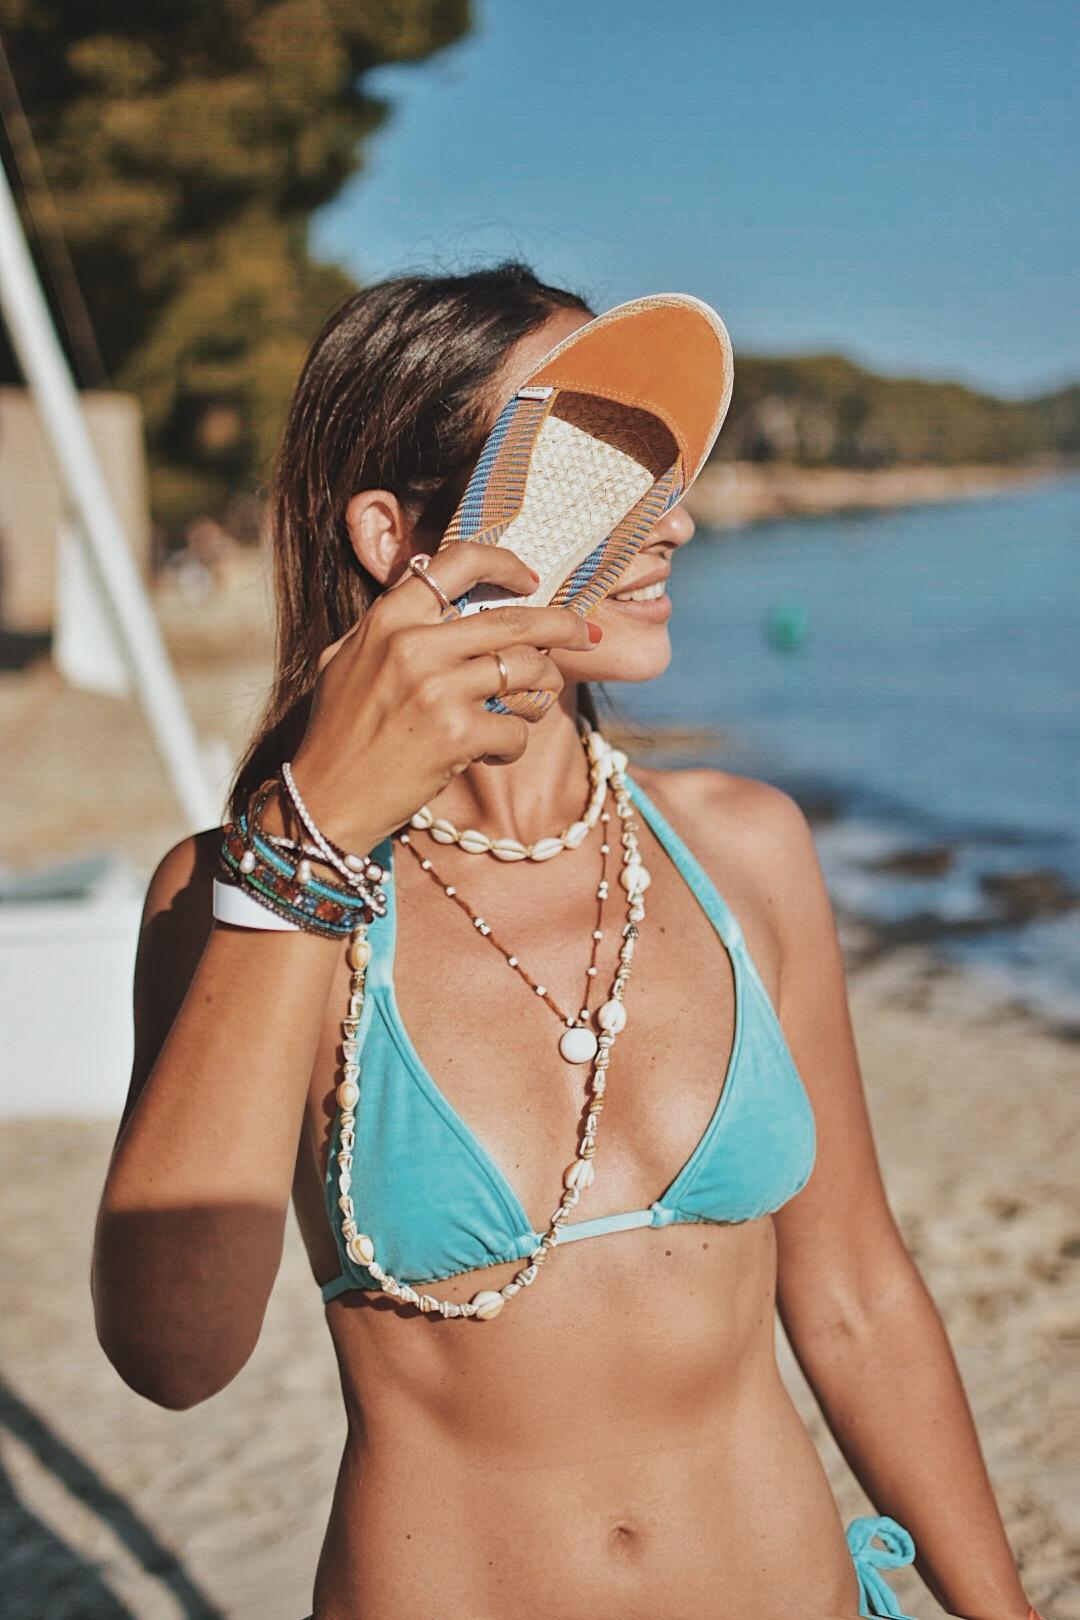 13-el-blog-de-silvia-bikini-azul-mallorca